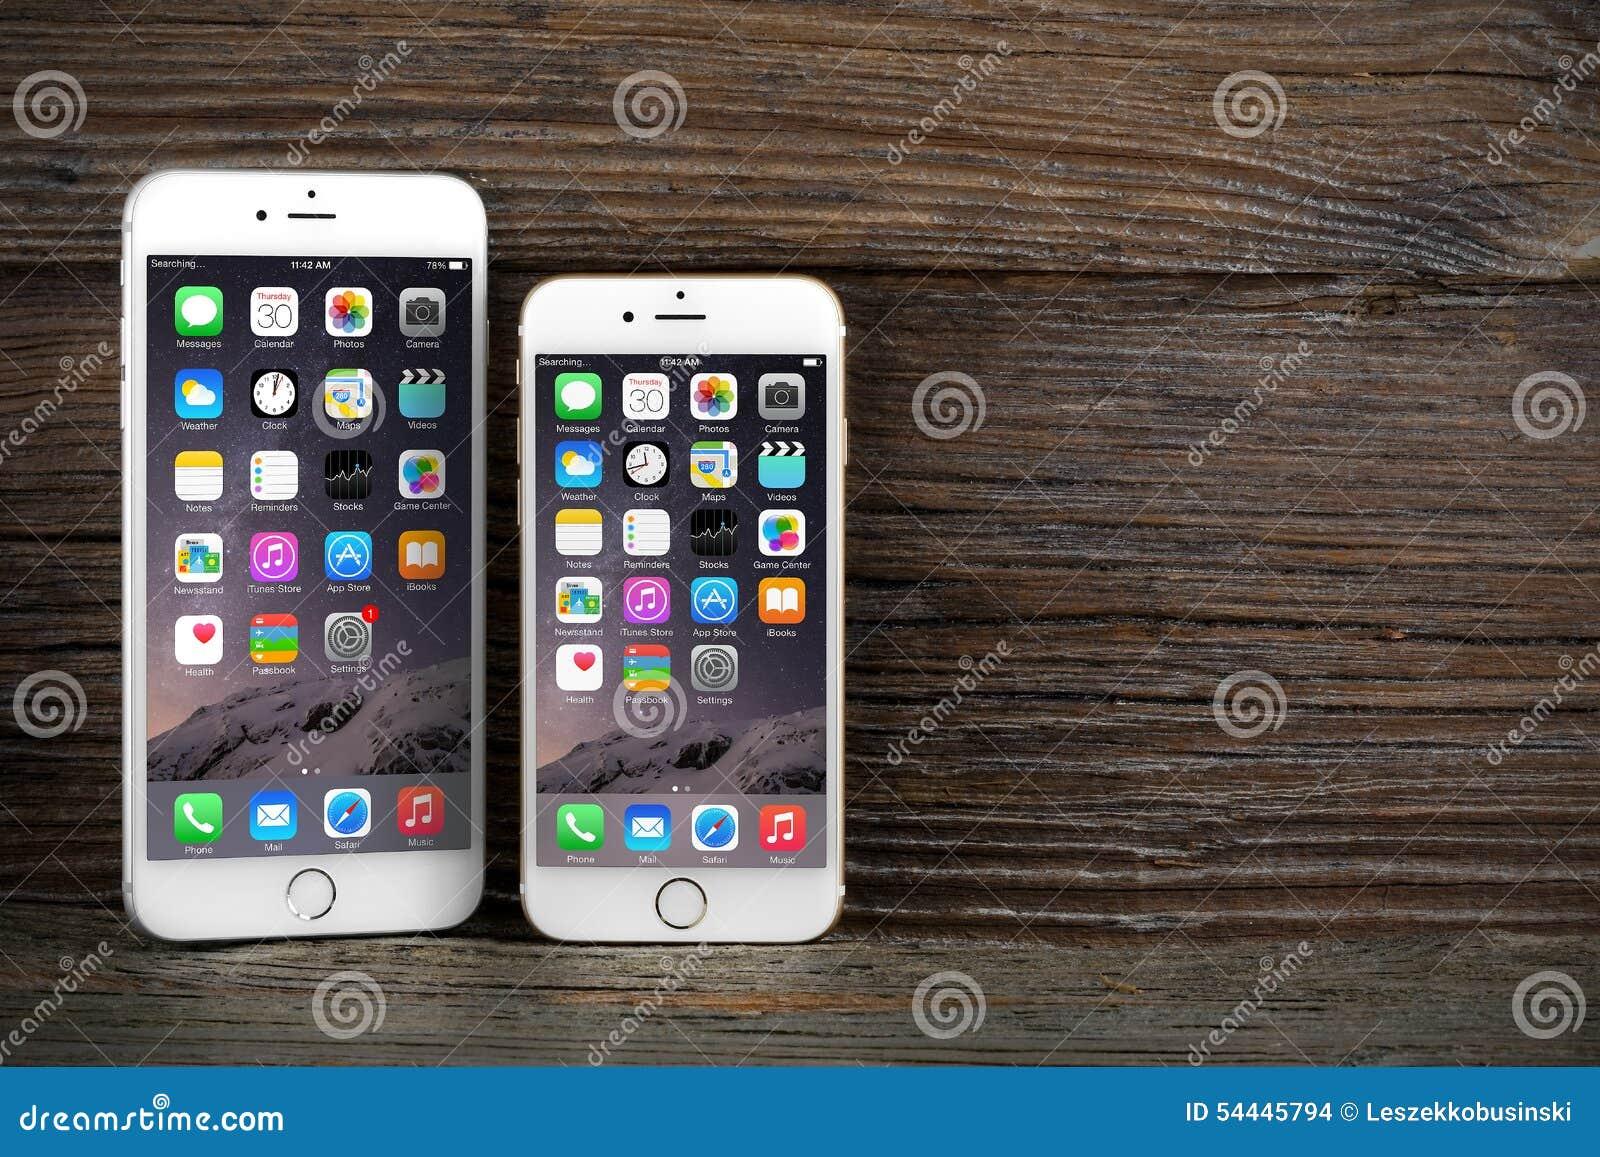 l 39 iphone 6 de diff rence de taille et iphone 6 plus image stock ditorial image 54445794. Black Bedroom Furniture Sets. Home Design Ideas